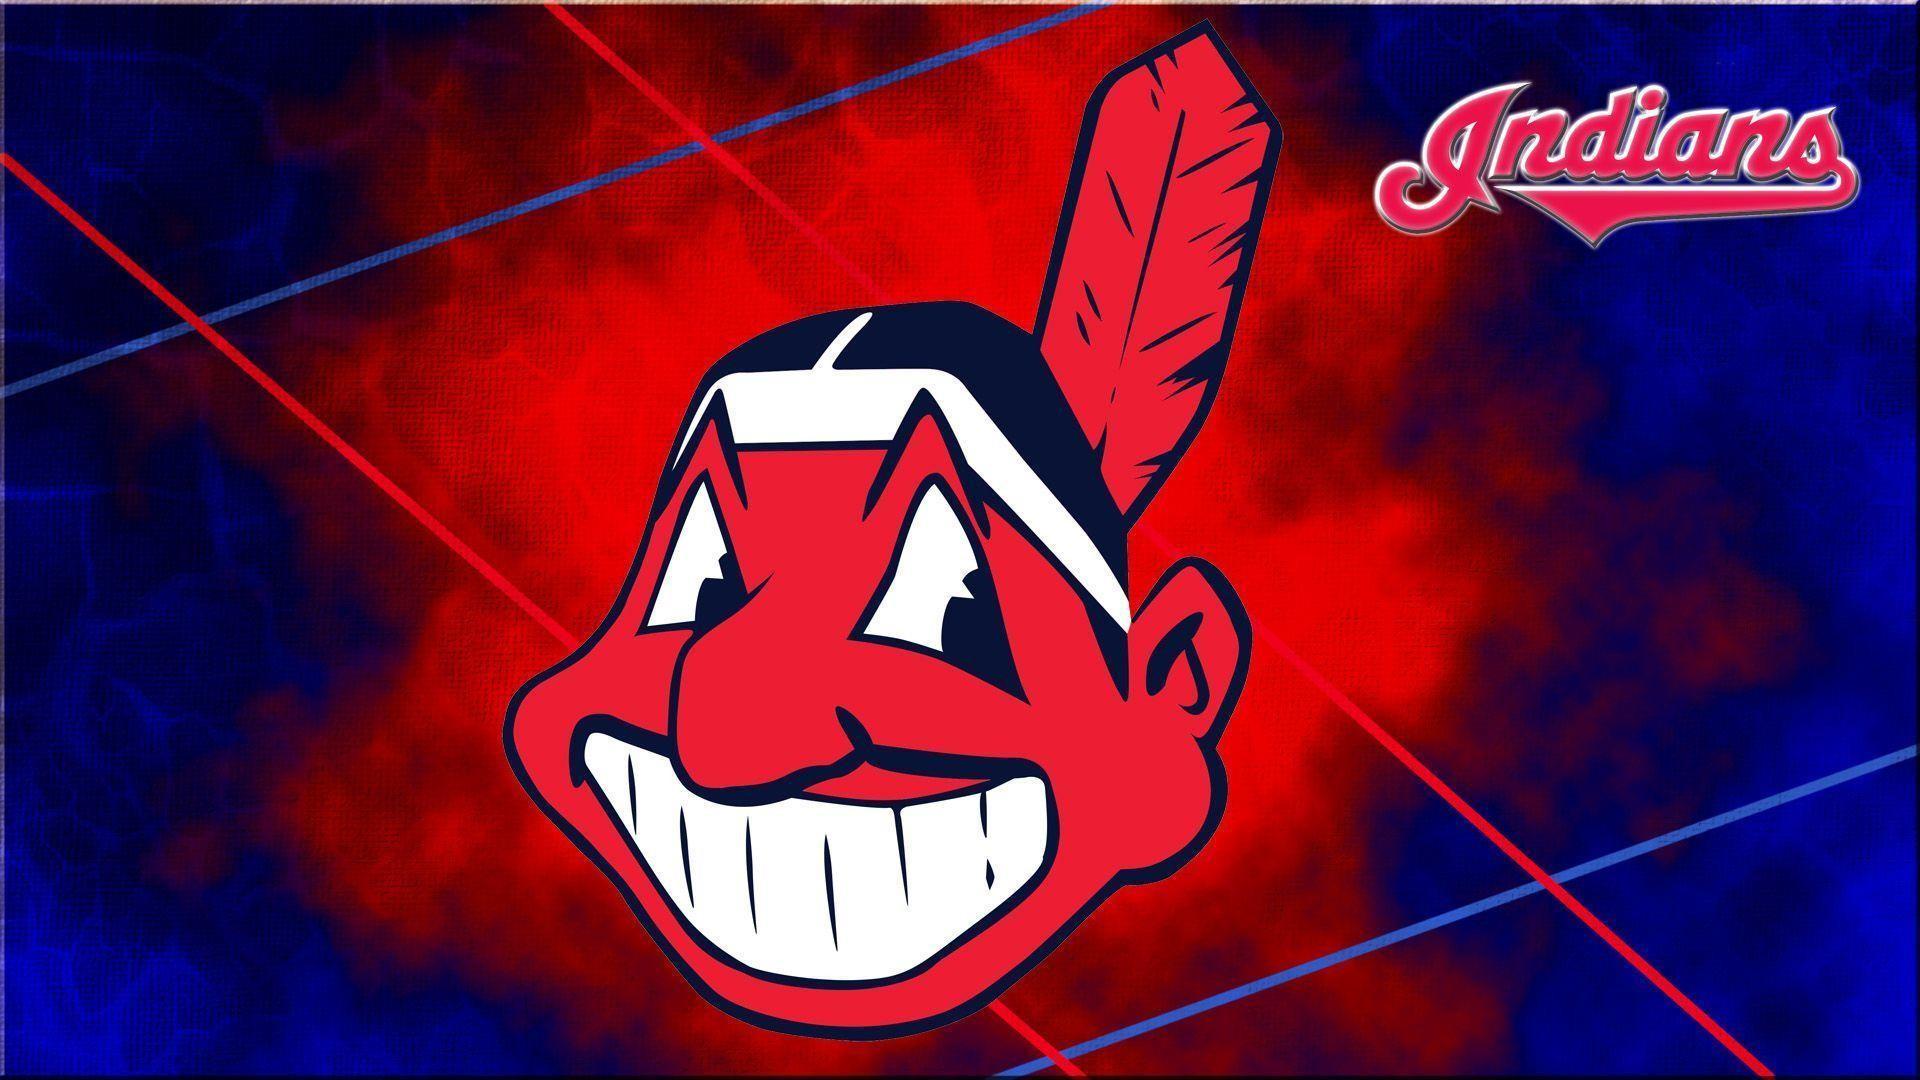 Cleveland Indians Wallpaper Screensaver – WallpaperSafari